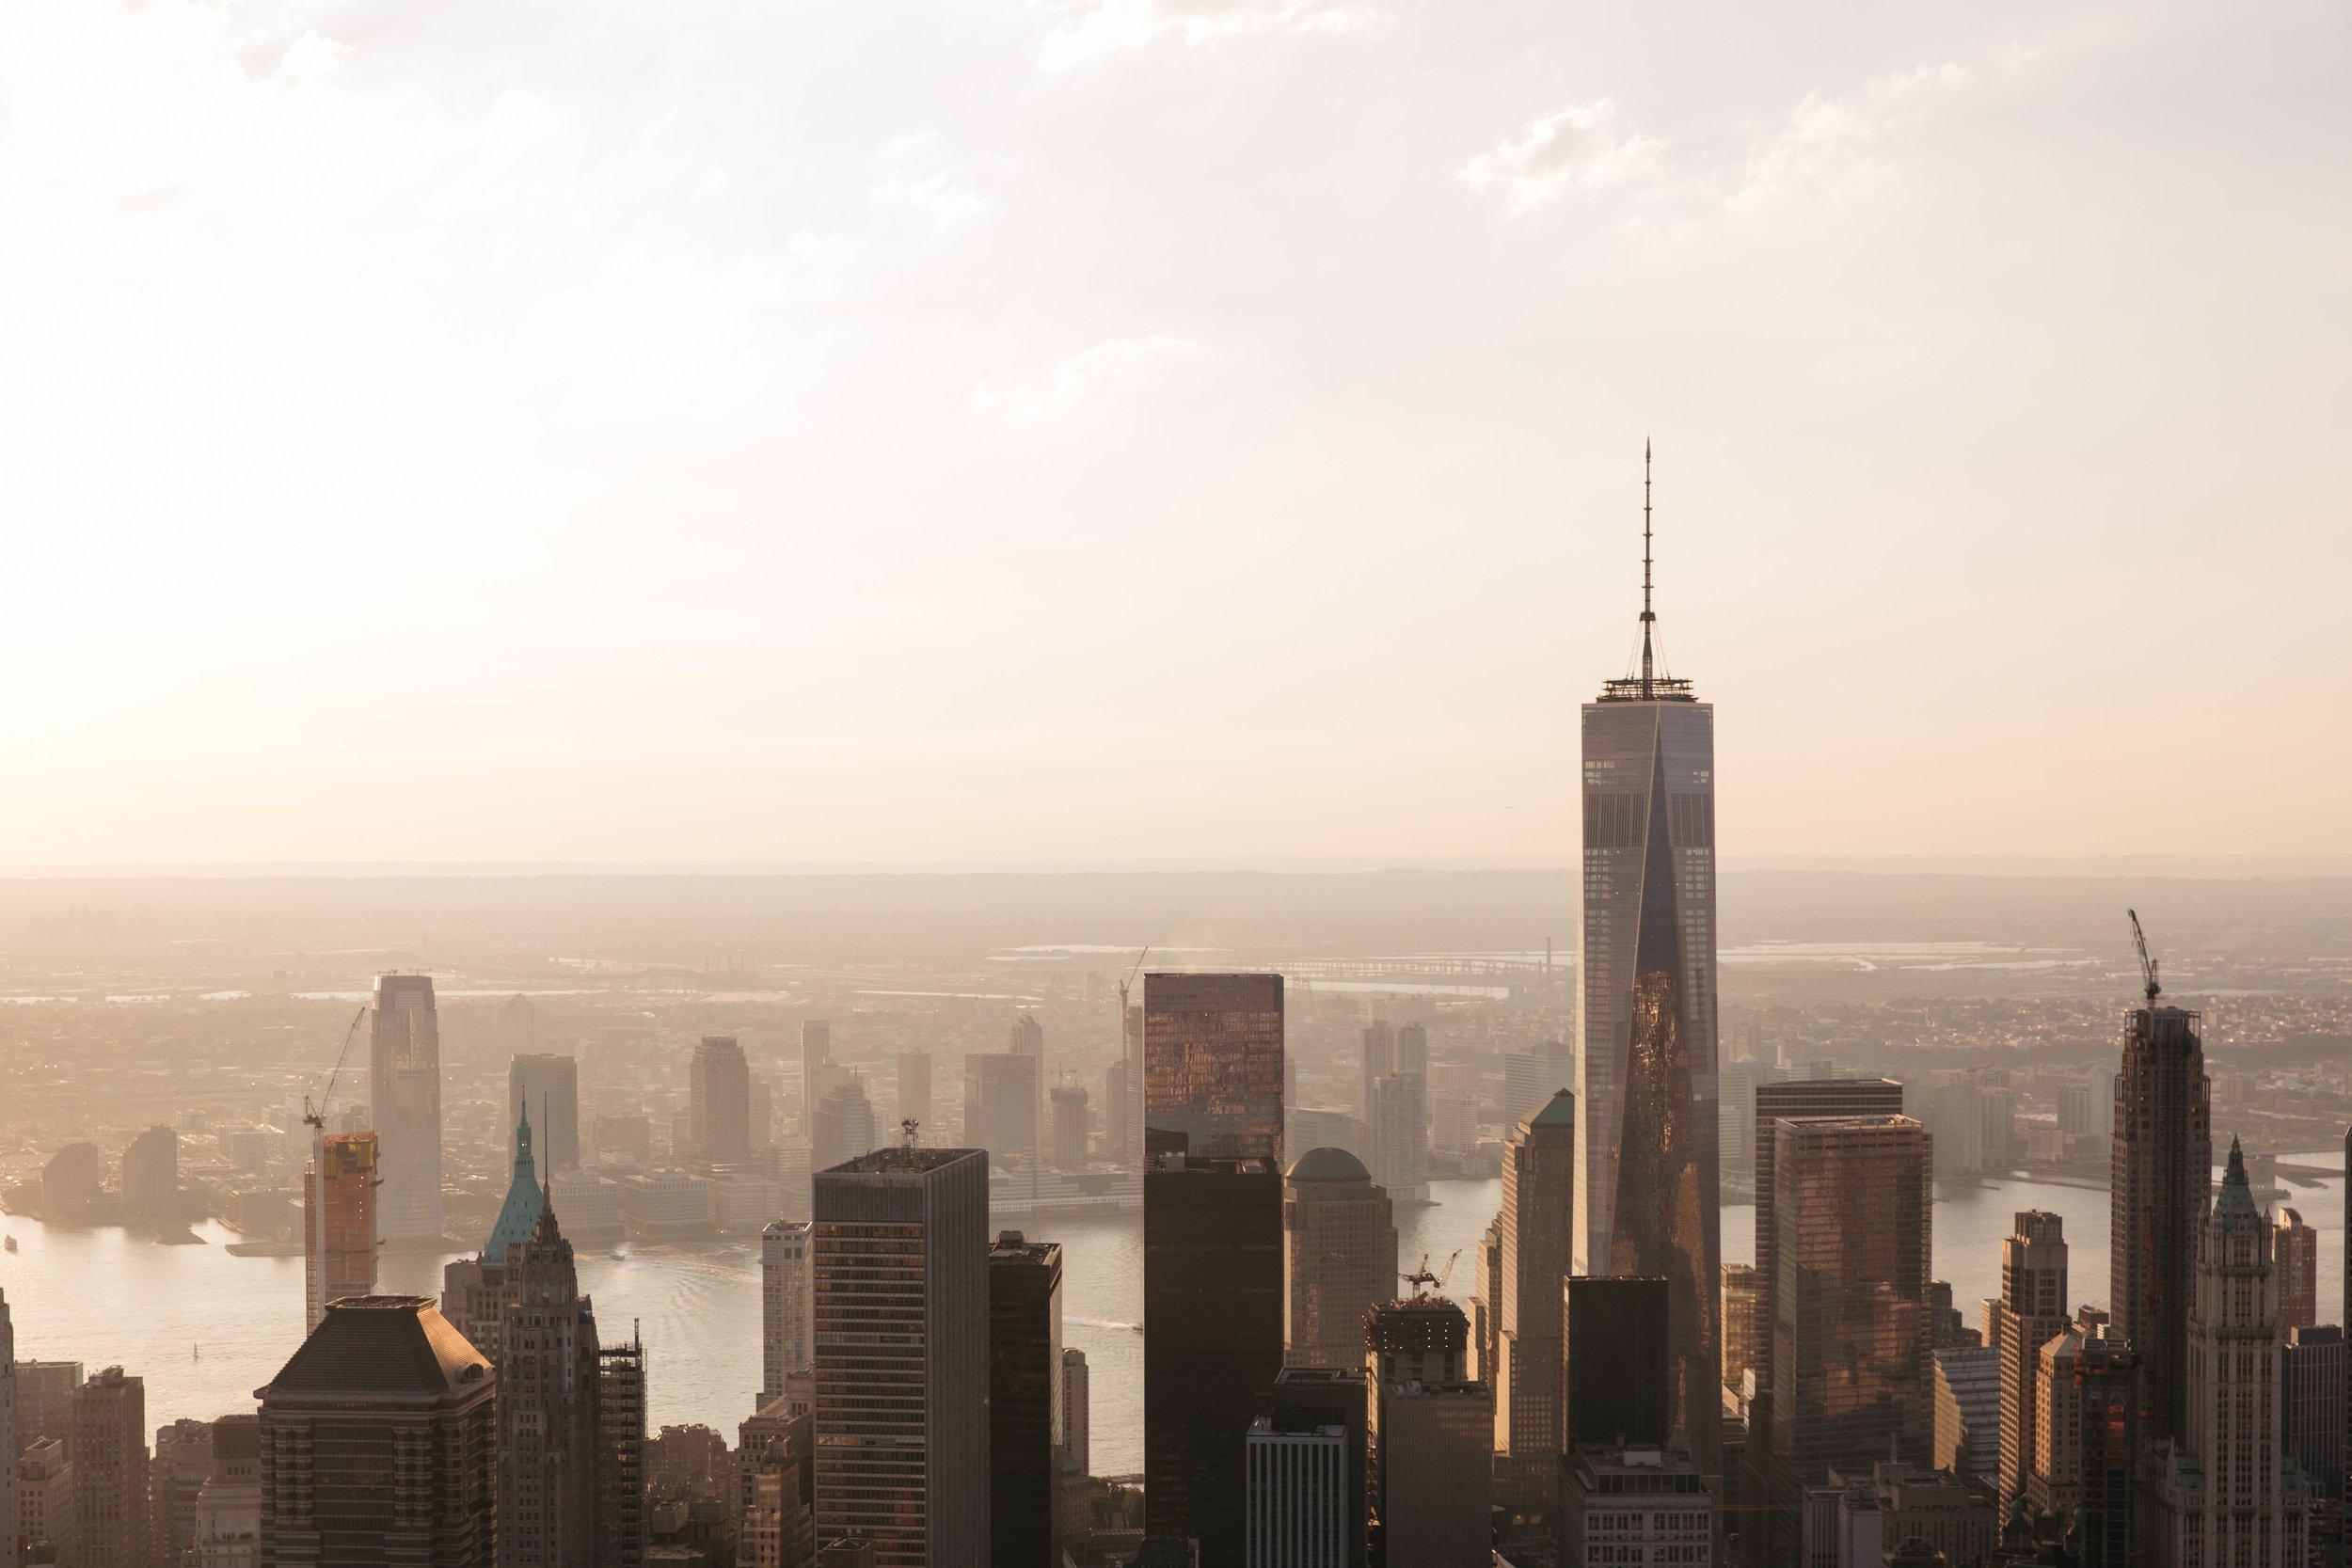 PatrickMichaelChin_NewYorkCity_Aerial_Cityscape.jpg